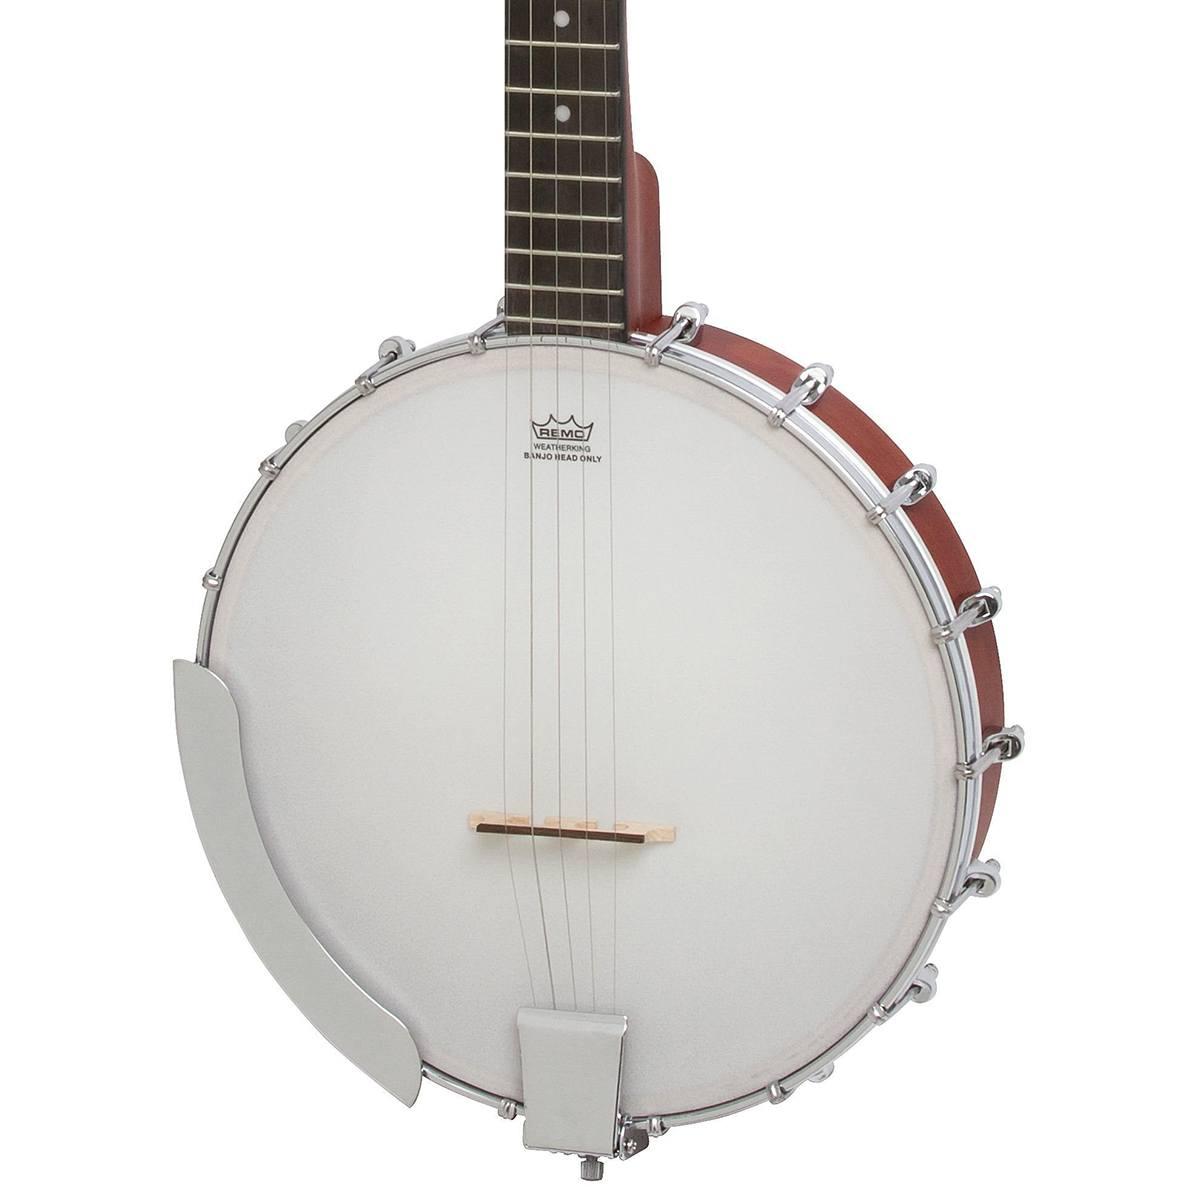 Epiphone MB-100 5-String Banjo for sale